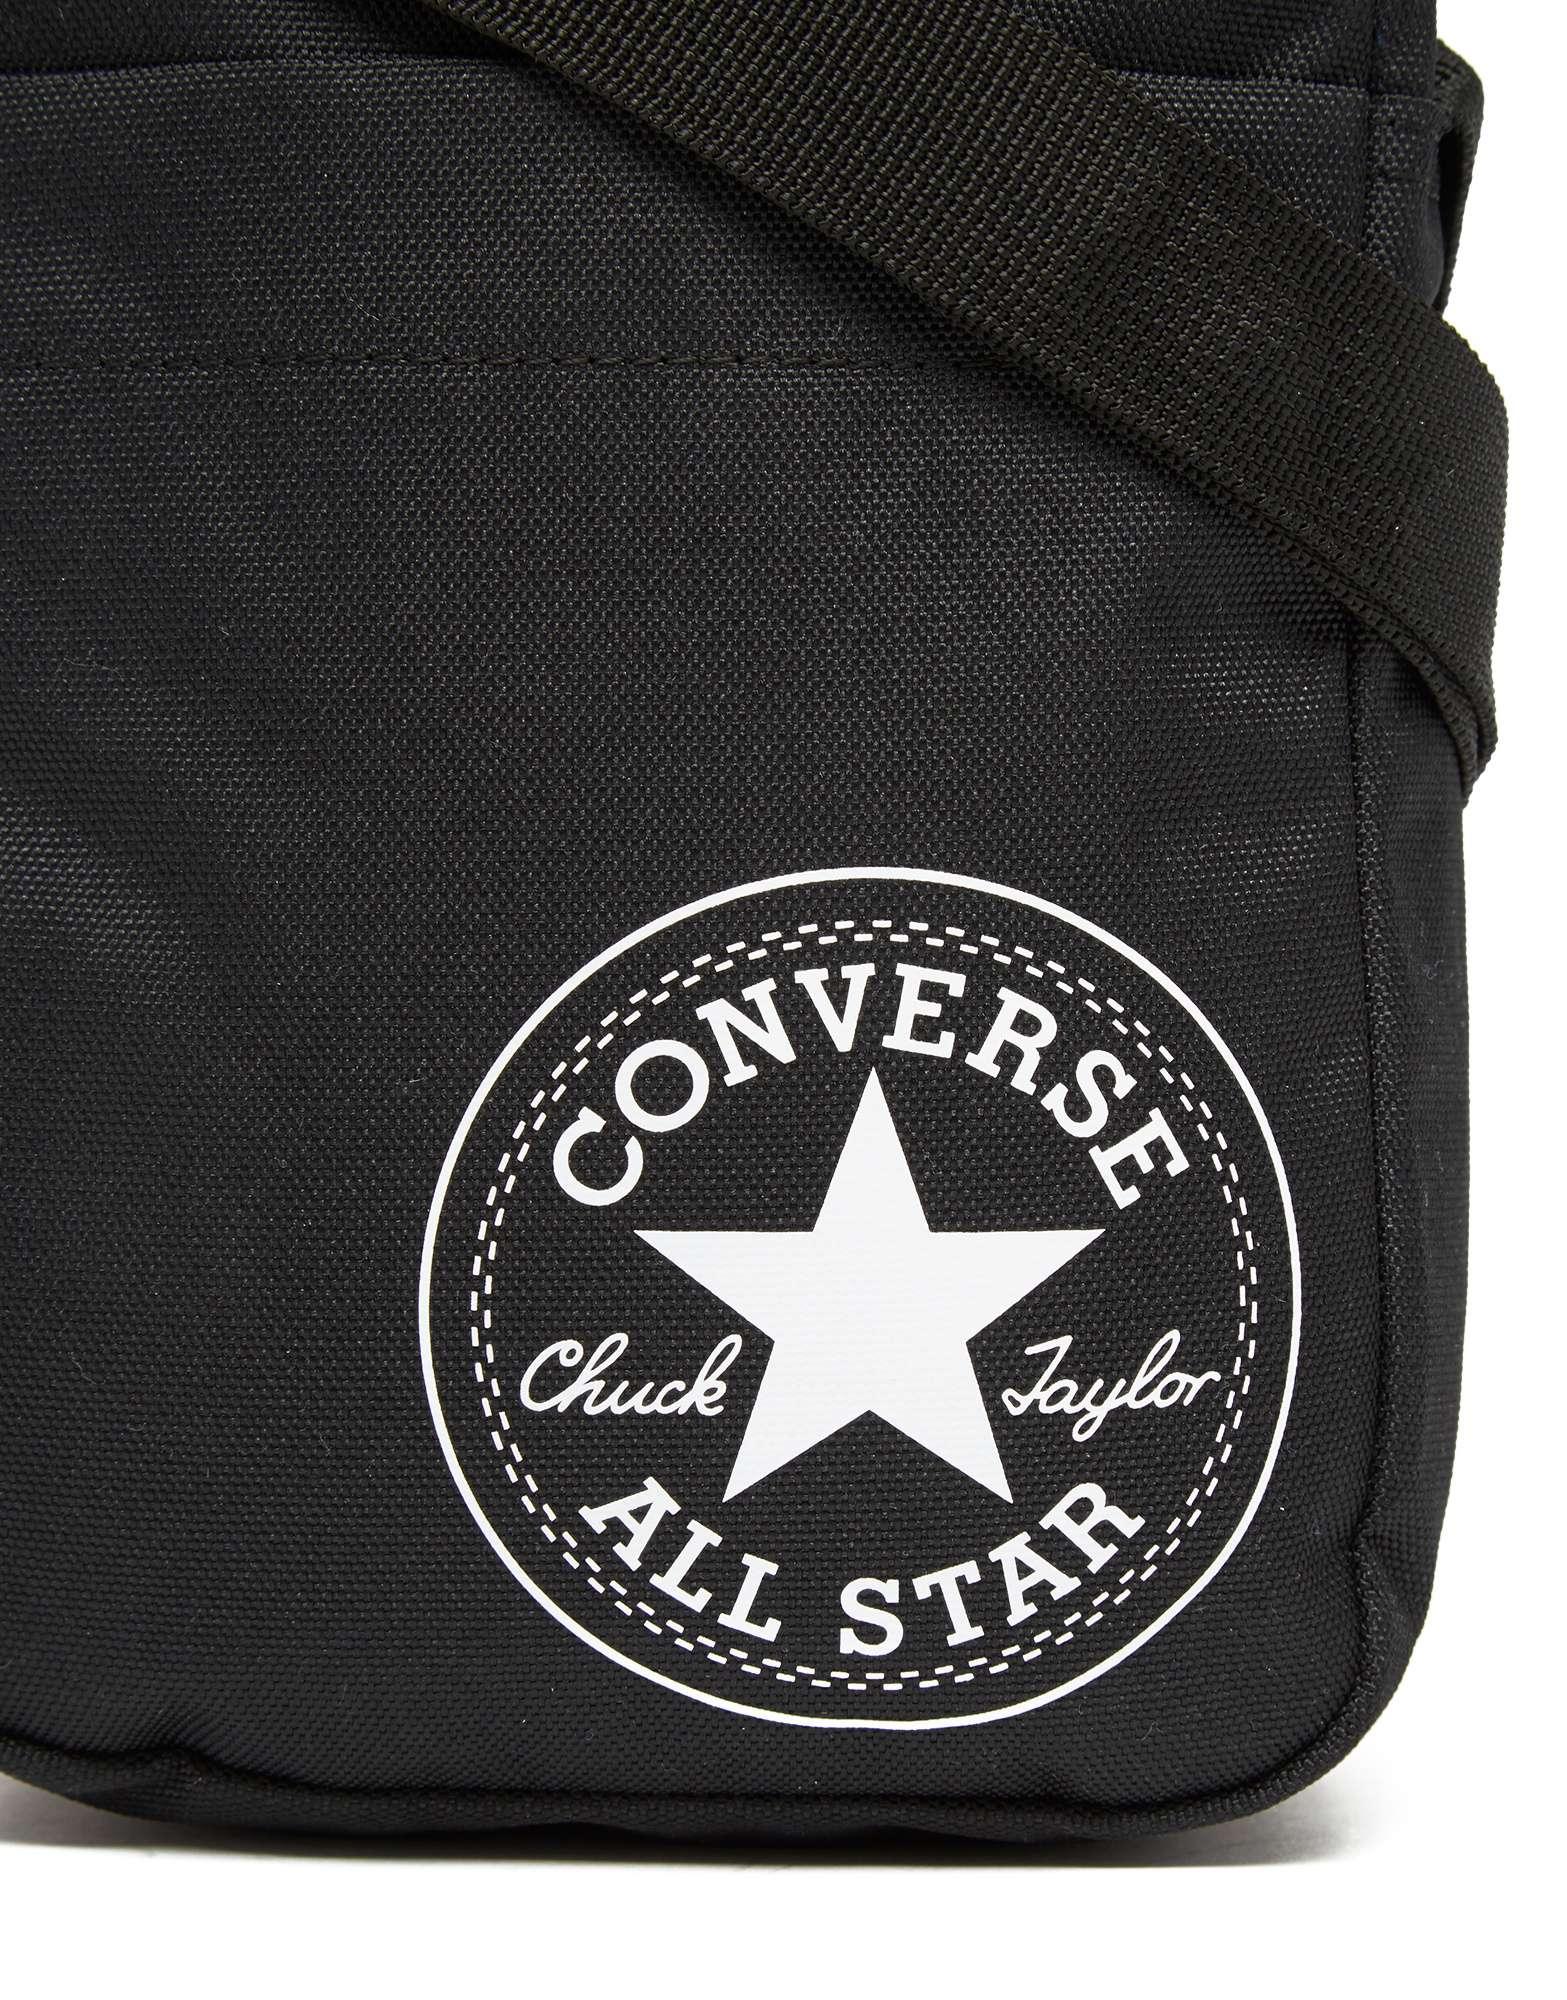 Converse City Small Items Bag